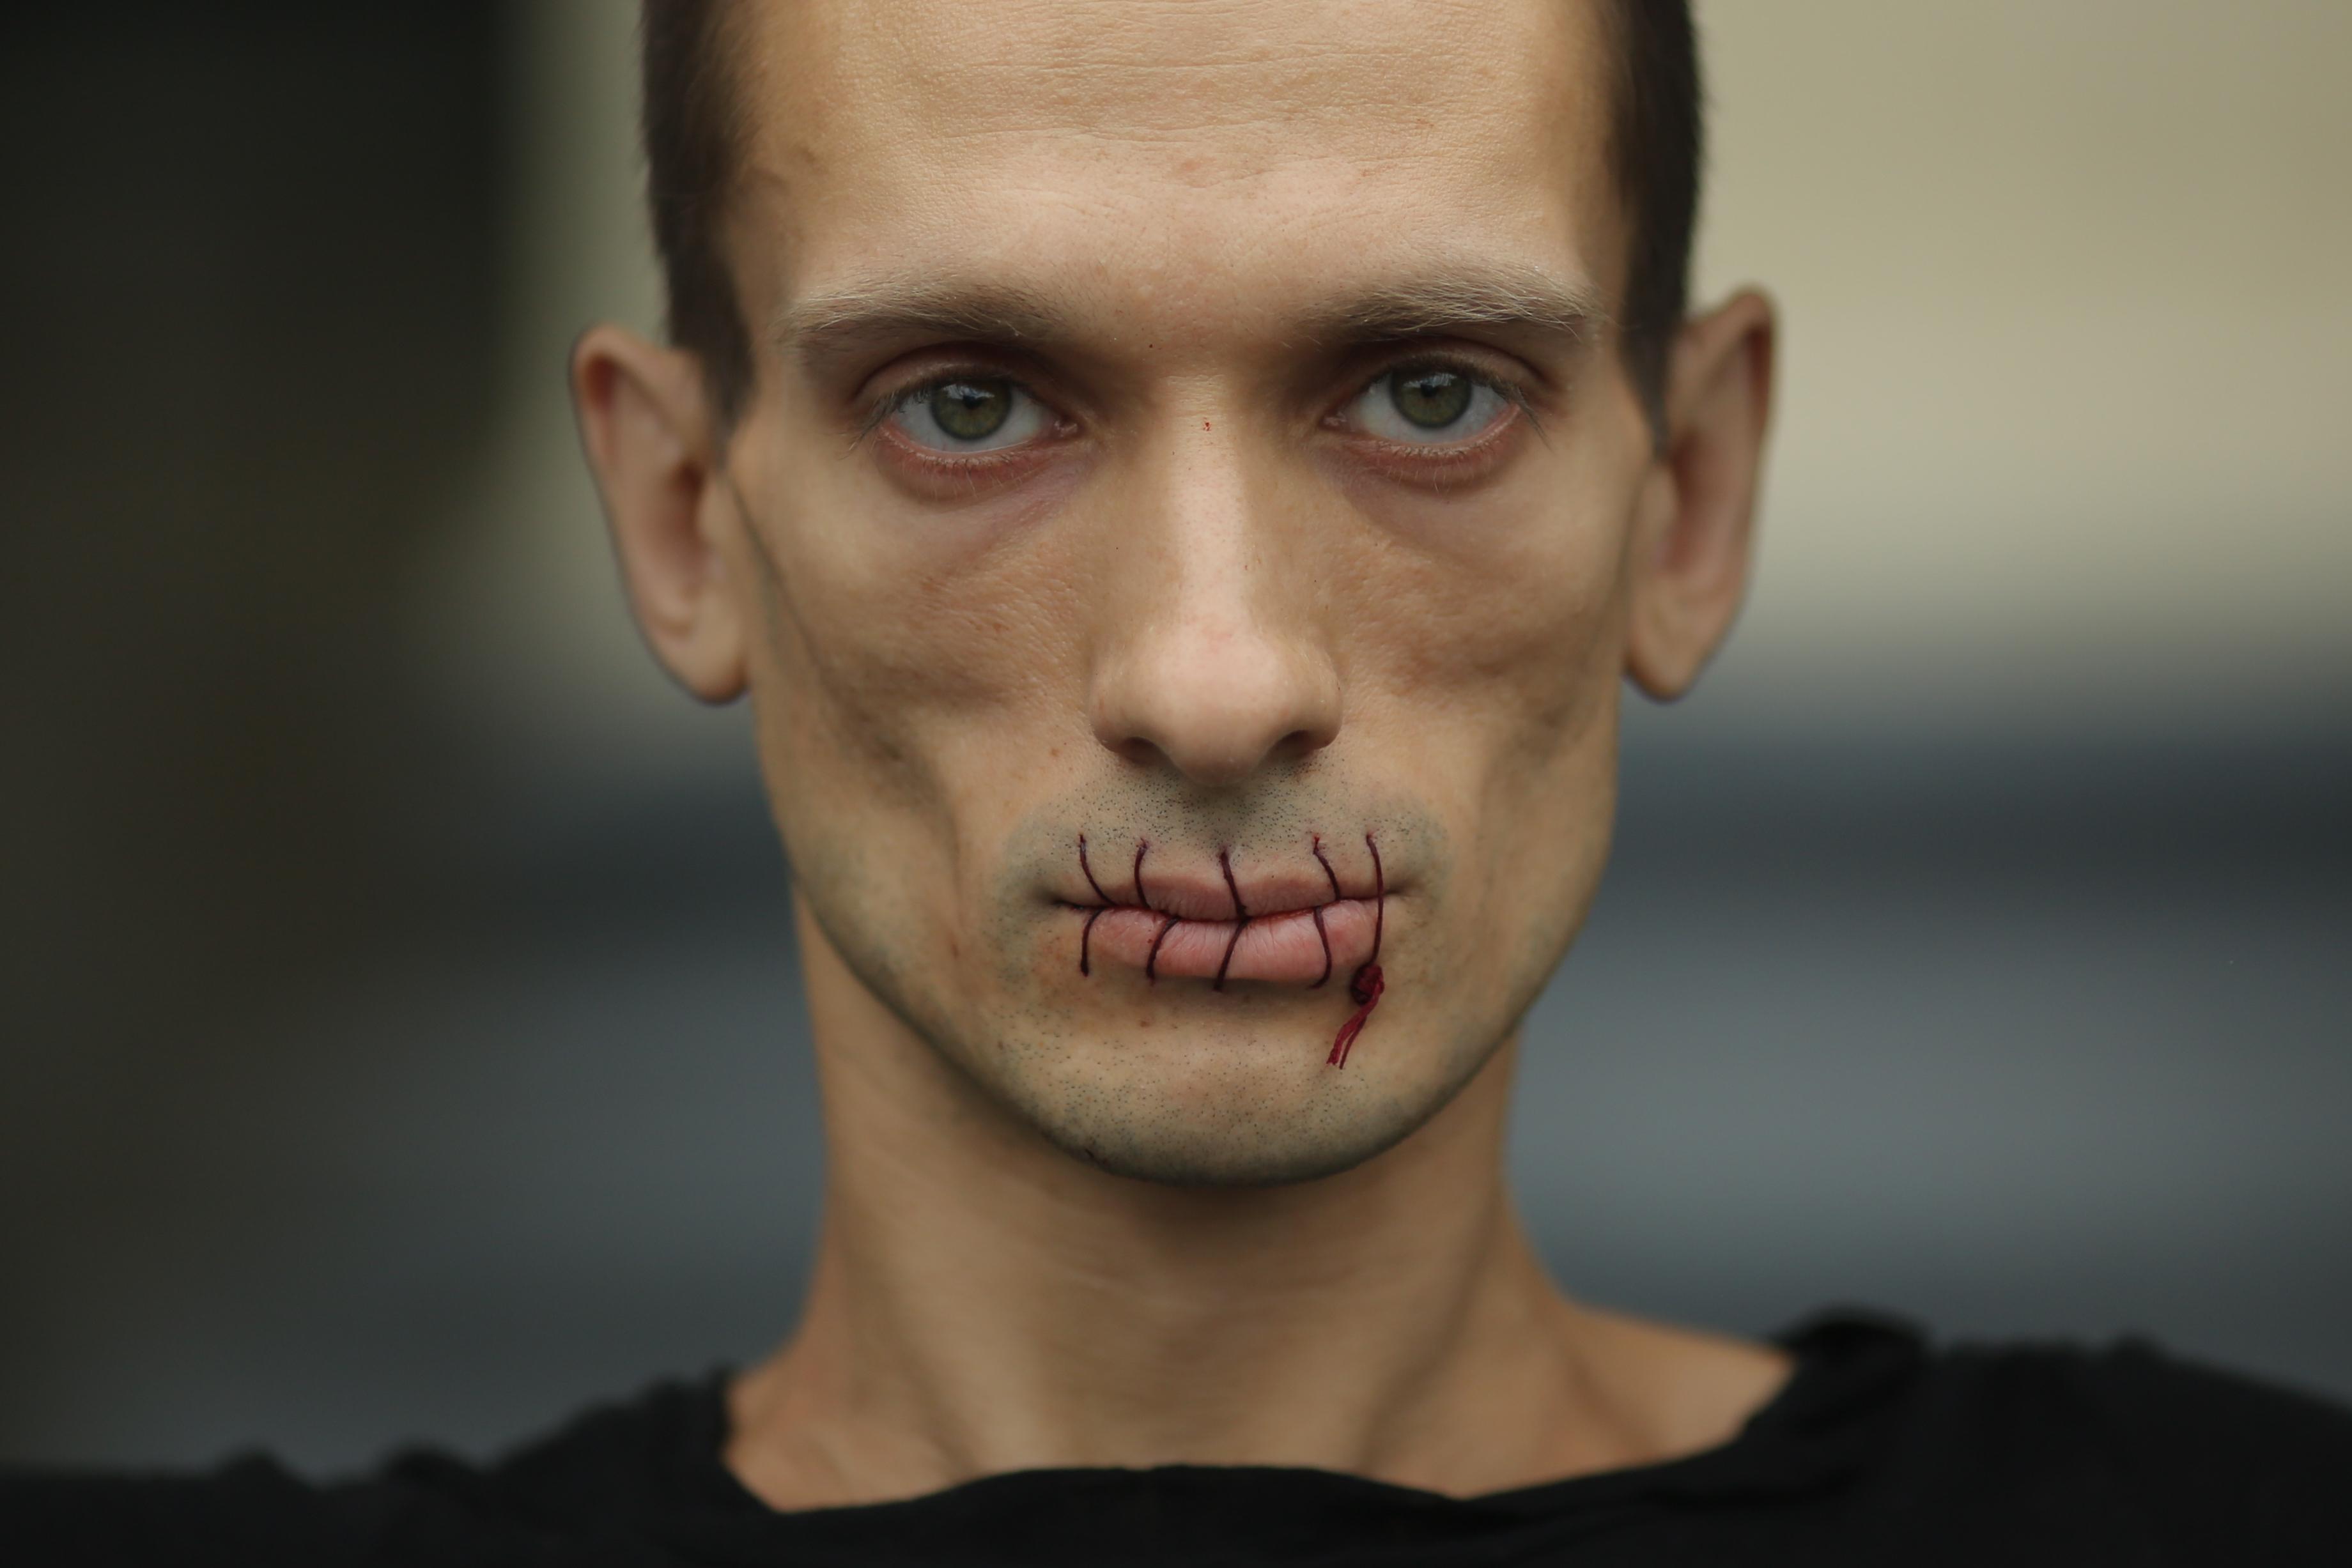 Suture, Piotr Pavlenski, 2012